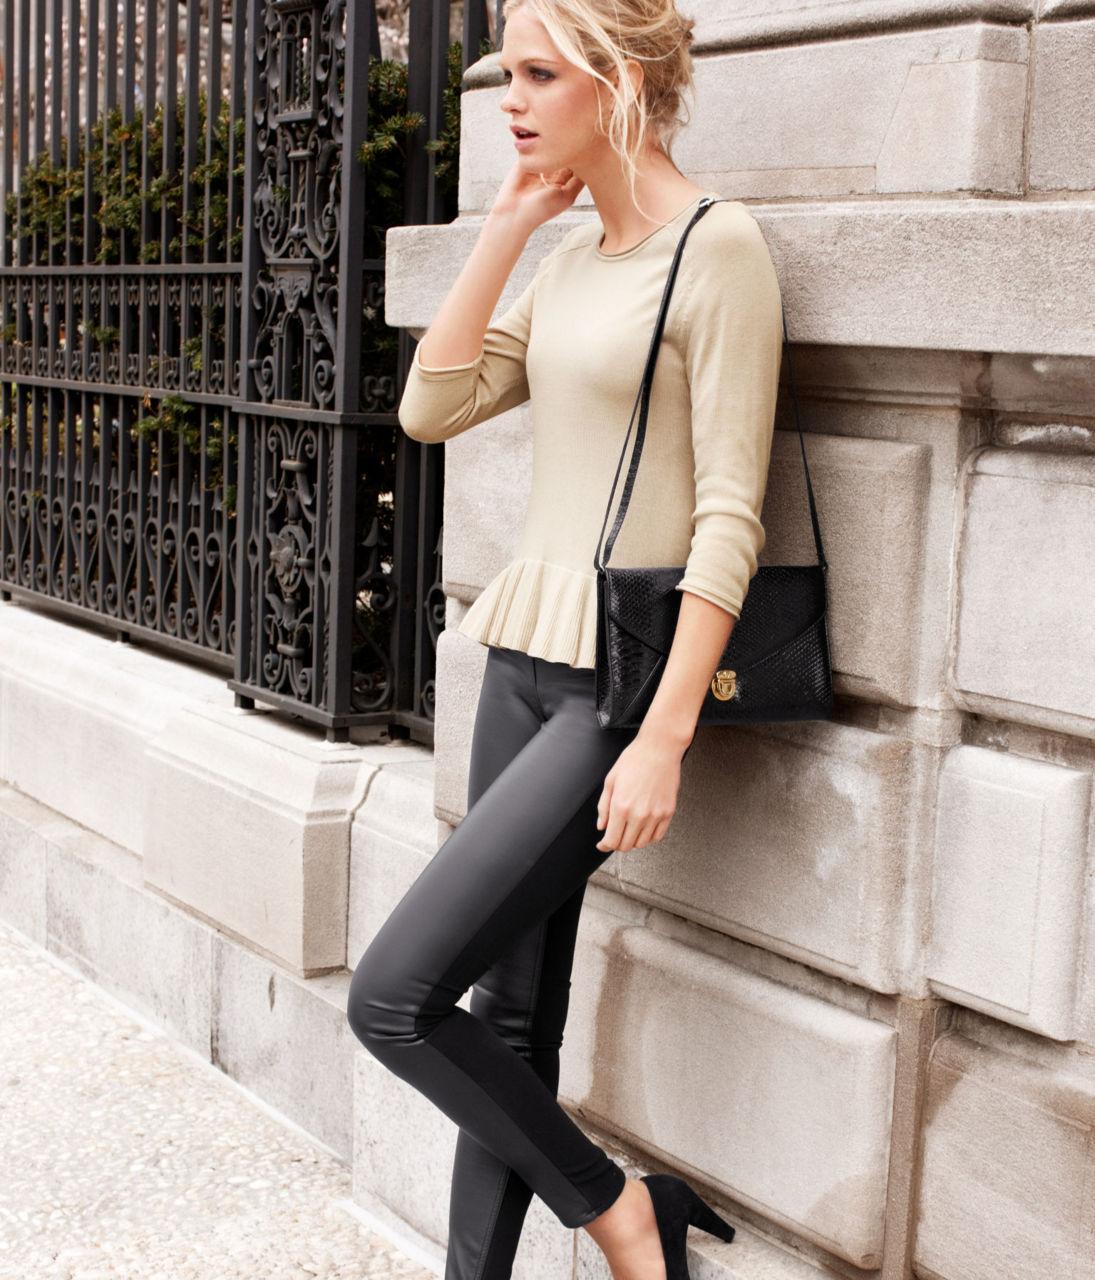 Girls Fashion Styles: Street Style Inspiration